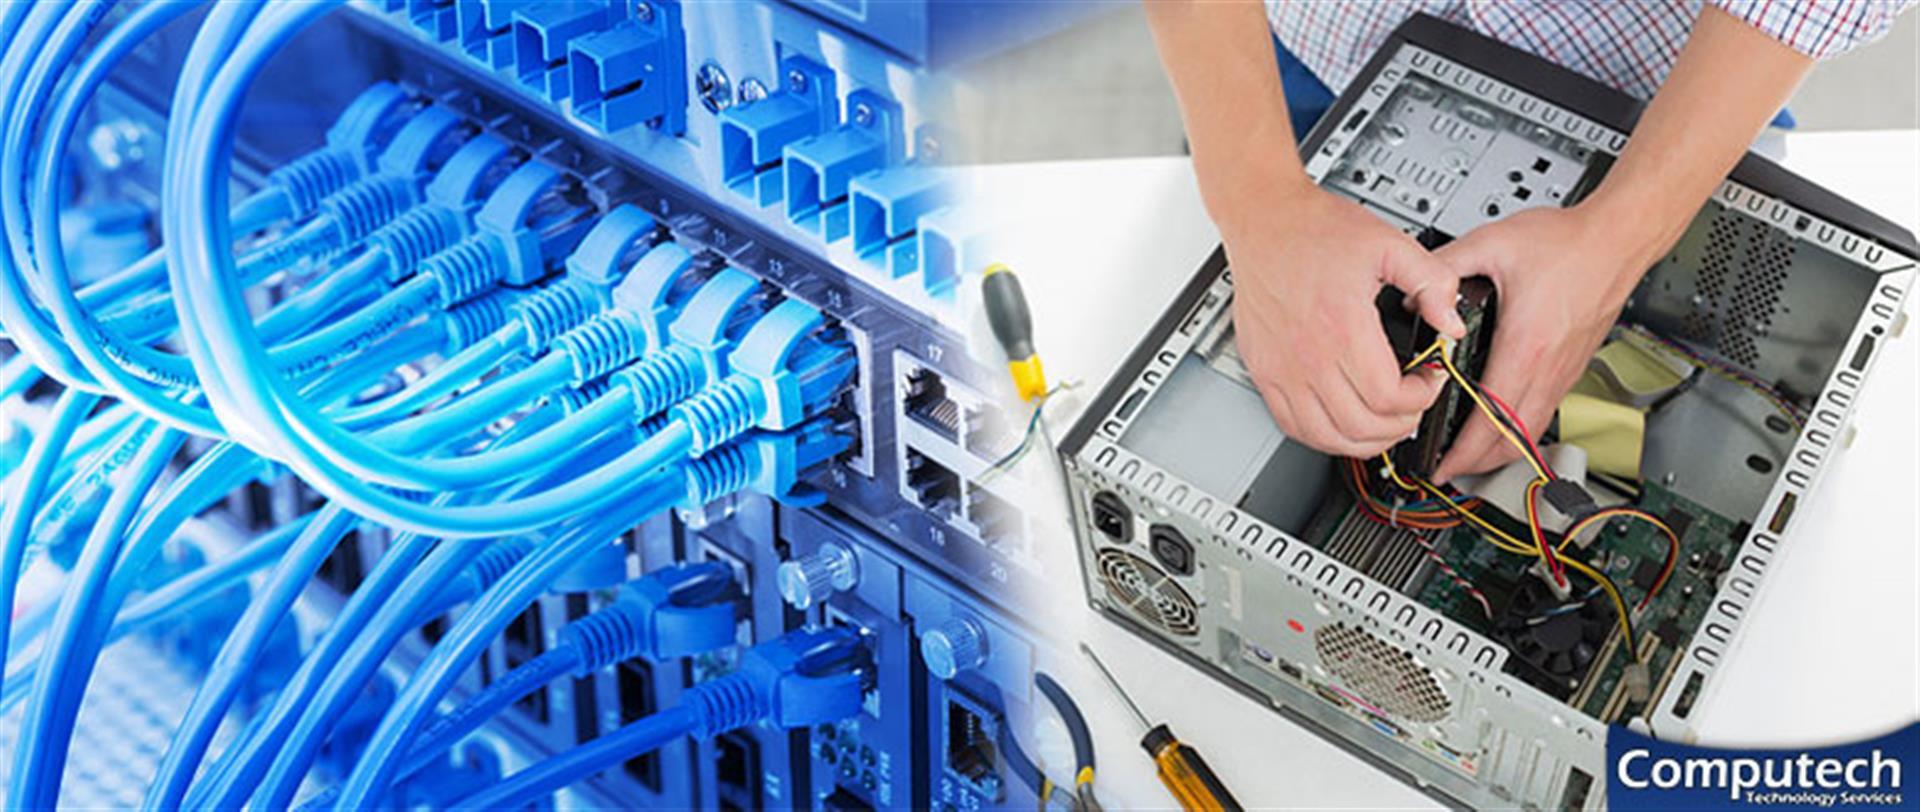 Petersburg Virginia On Site Computer PC & Printer Repair, Networks, Voice & Data Cabling Solutions